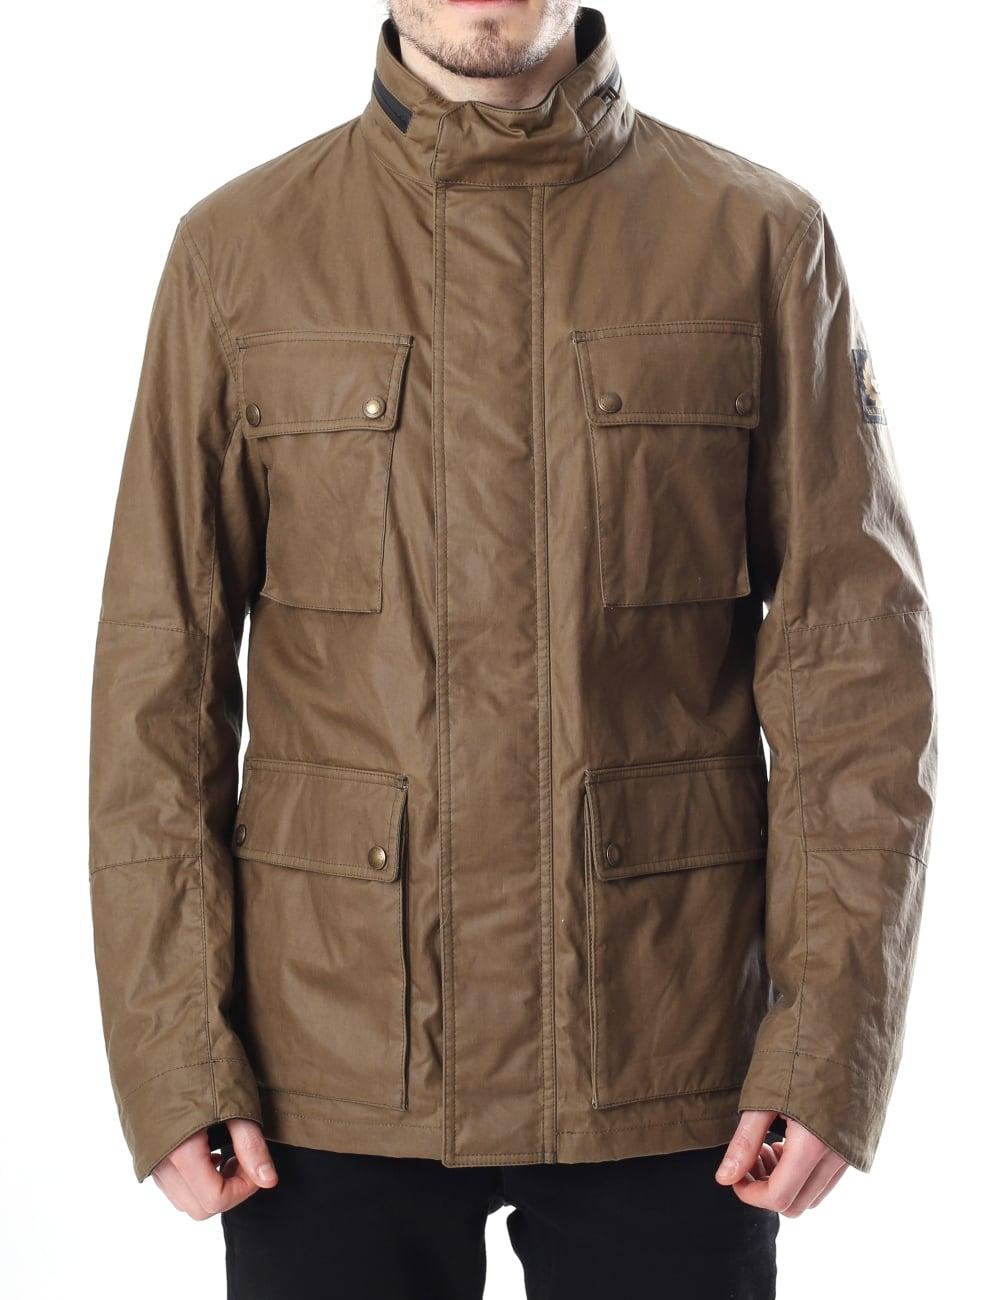 701d092662 Belstaff Explorer Men s Waxed Jacket